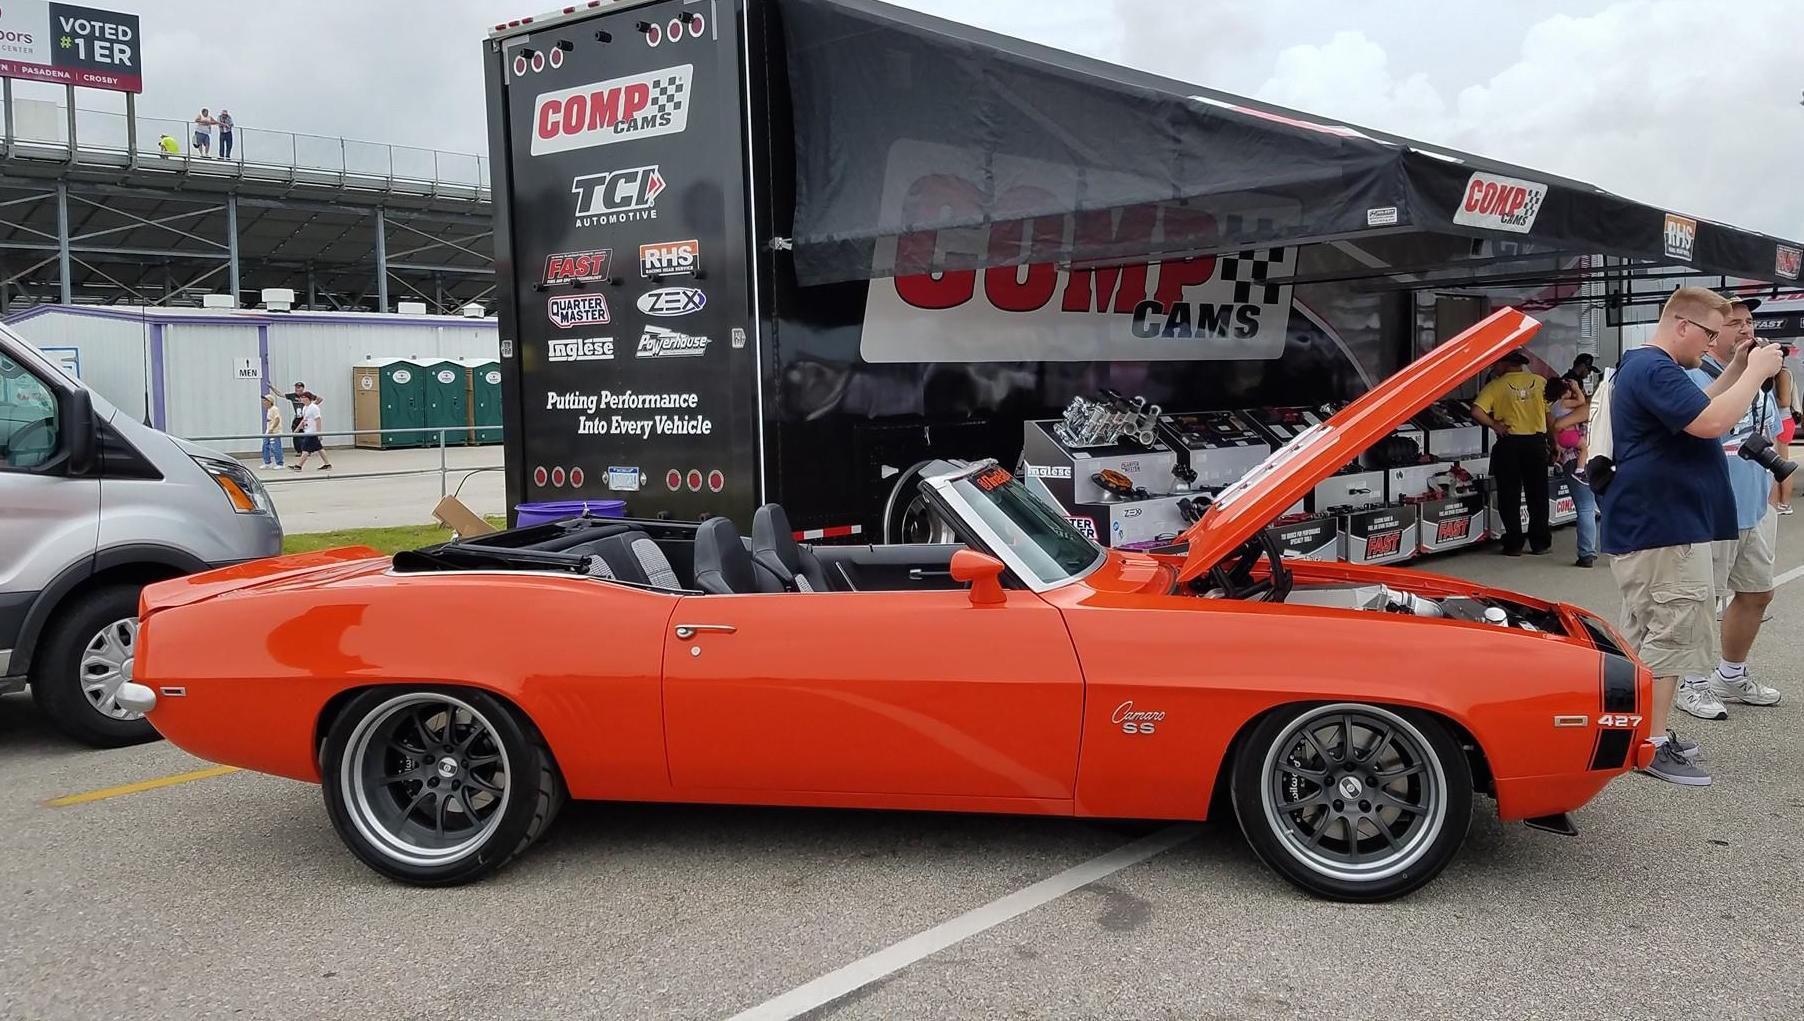 1969 Chevrolet Camaro | Tony Whatley's '69 Camaro SS 350 Convertible on Forgeline GZ3 Wheels